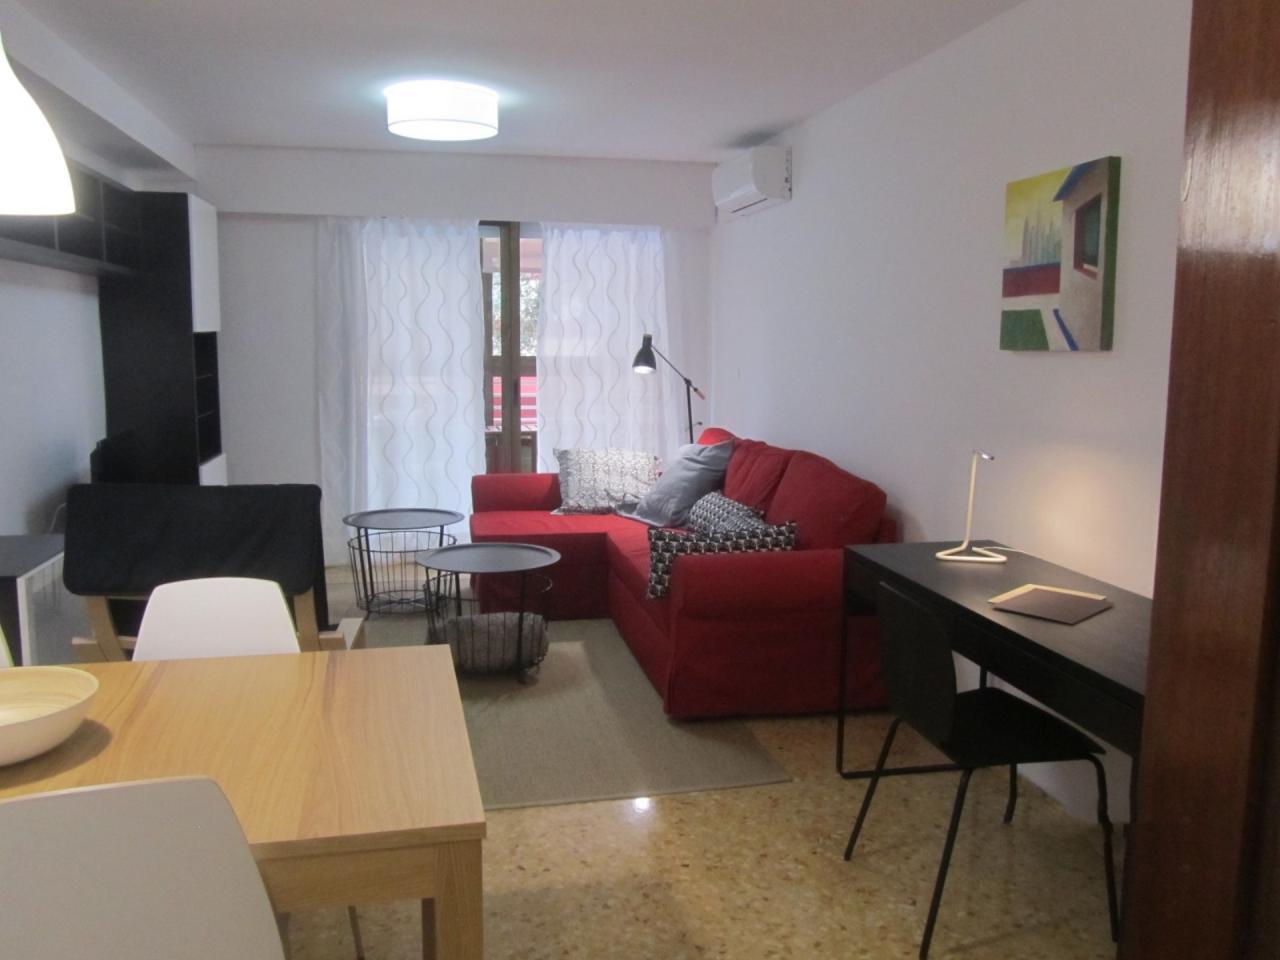 Flat for rent in Ciutat Jardí – Ref. 001090